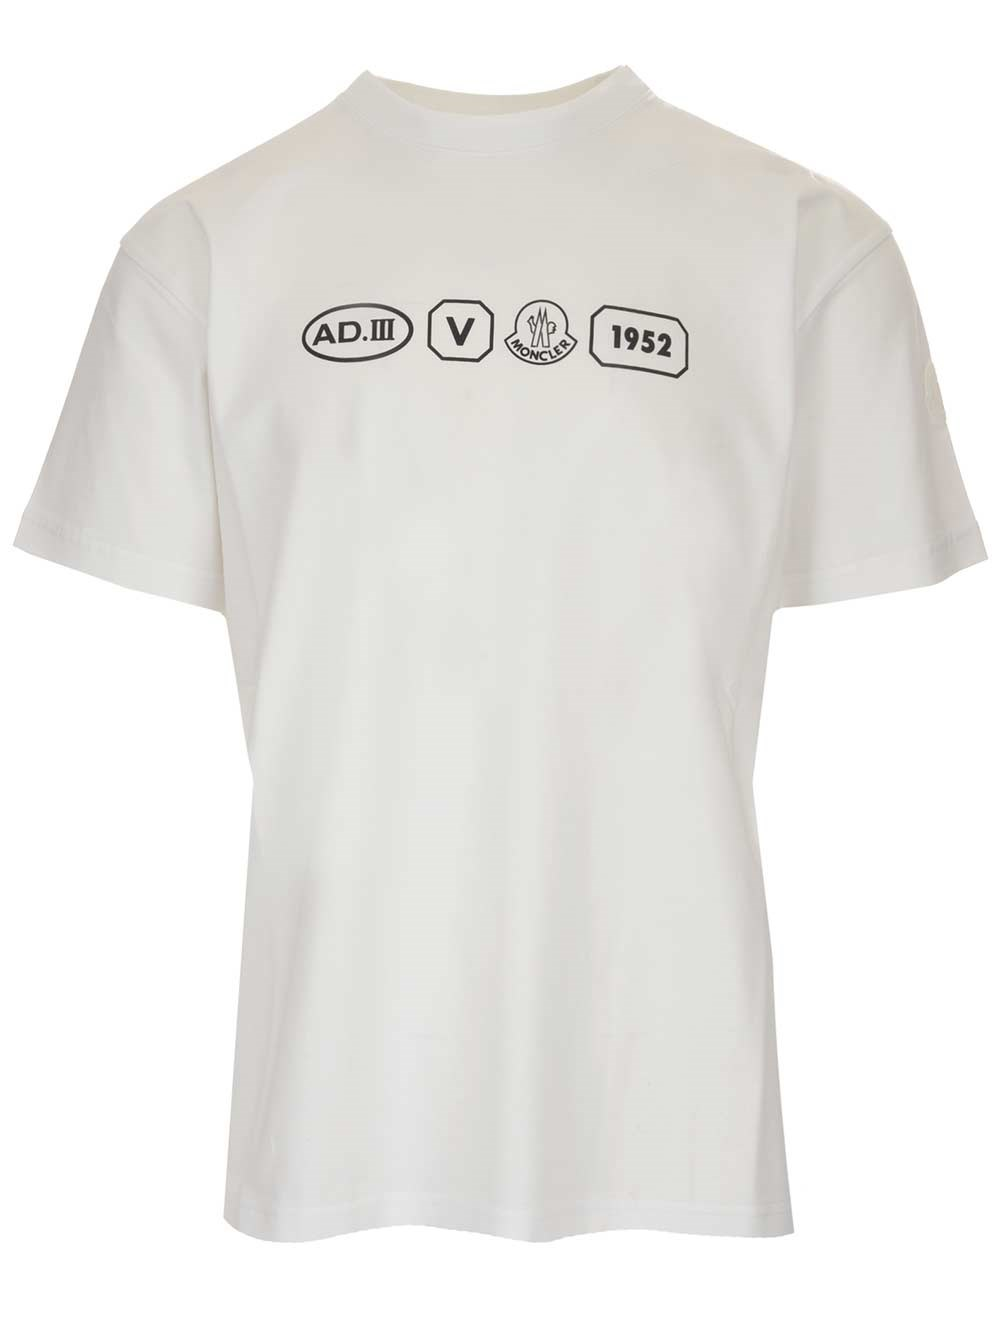 MONCLER GENIUS T-Shirt - 2 Moncler 1952